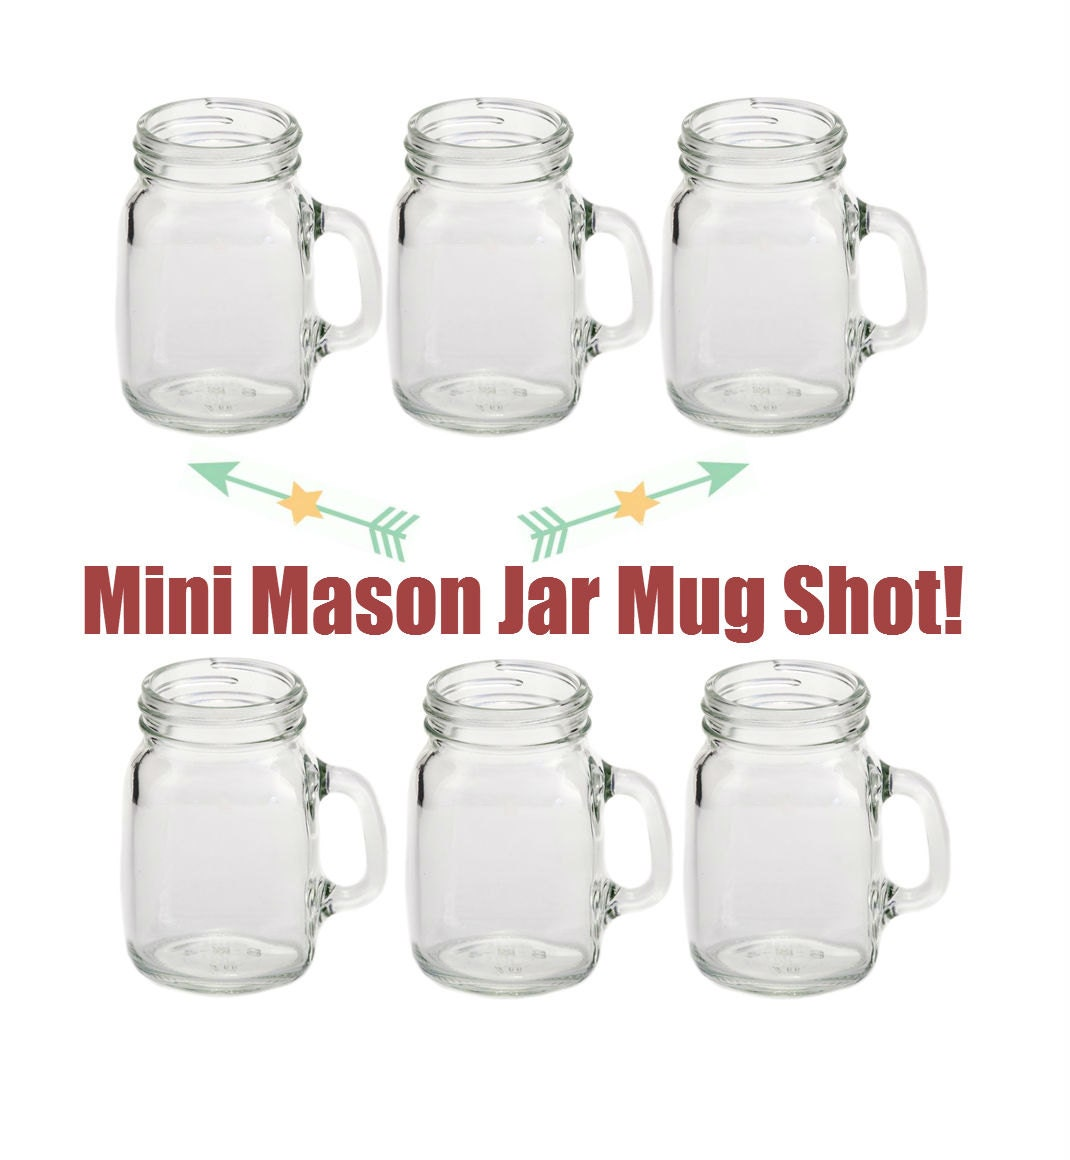 6 4oz Mini Mason Jar Mug Shot Glasses Set of 6